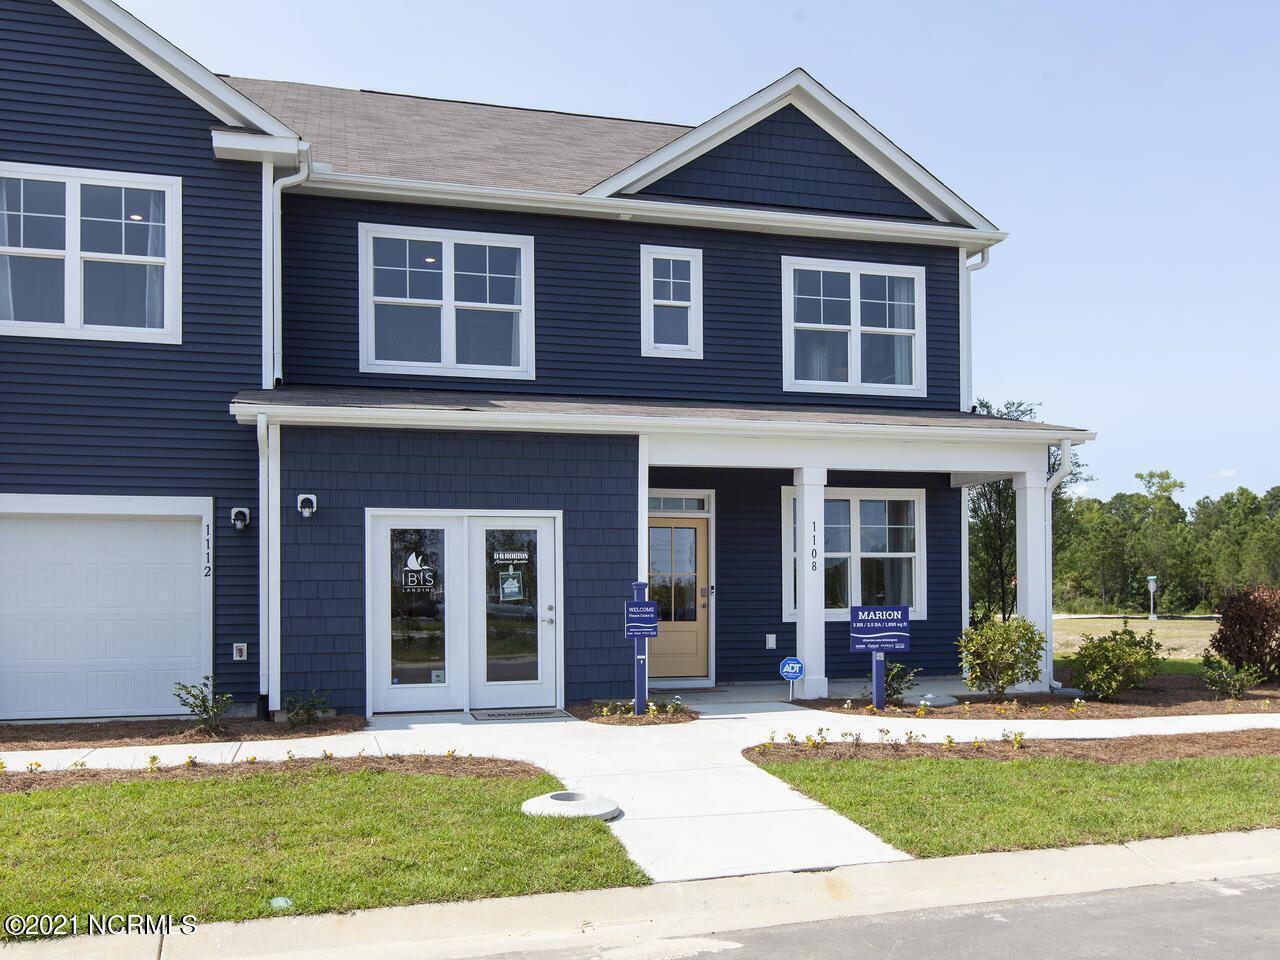 Photo of 7634 Knightbell Circle #Lot 42, Leland, NC 28451 (MLS # 100278408)